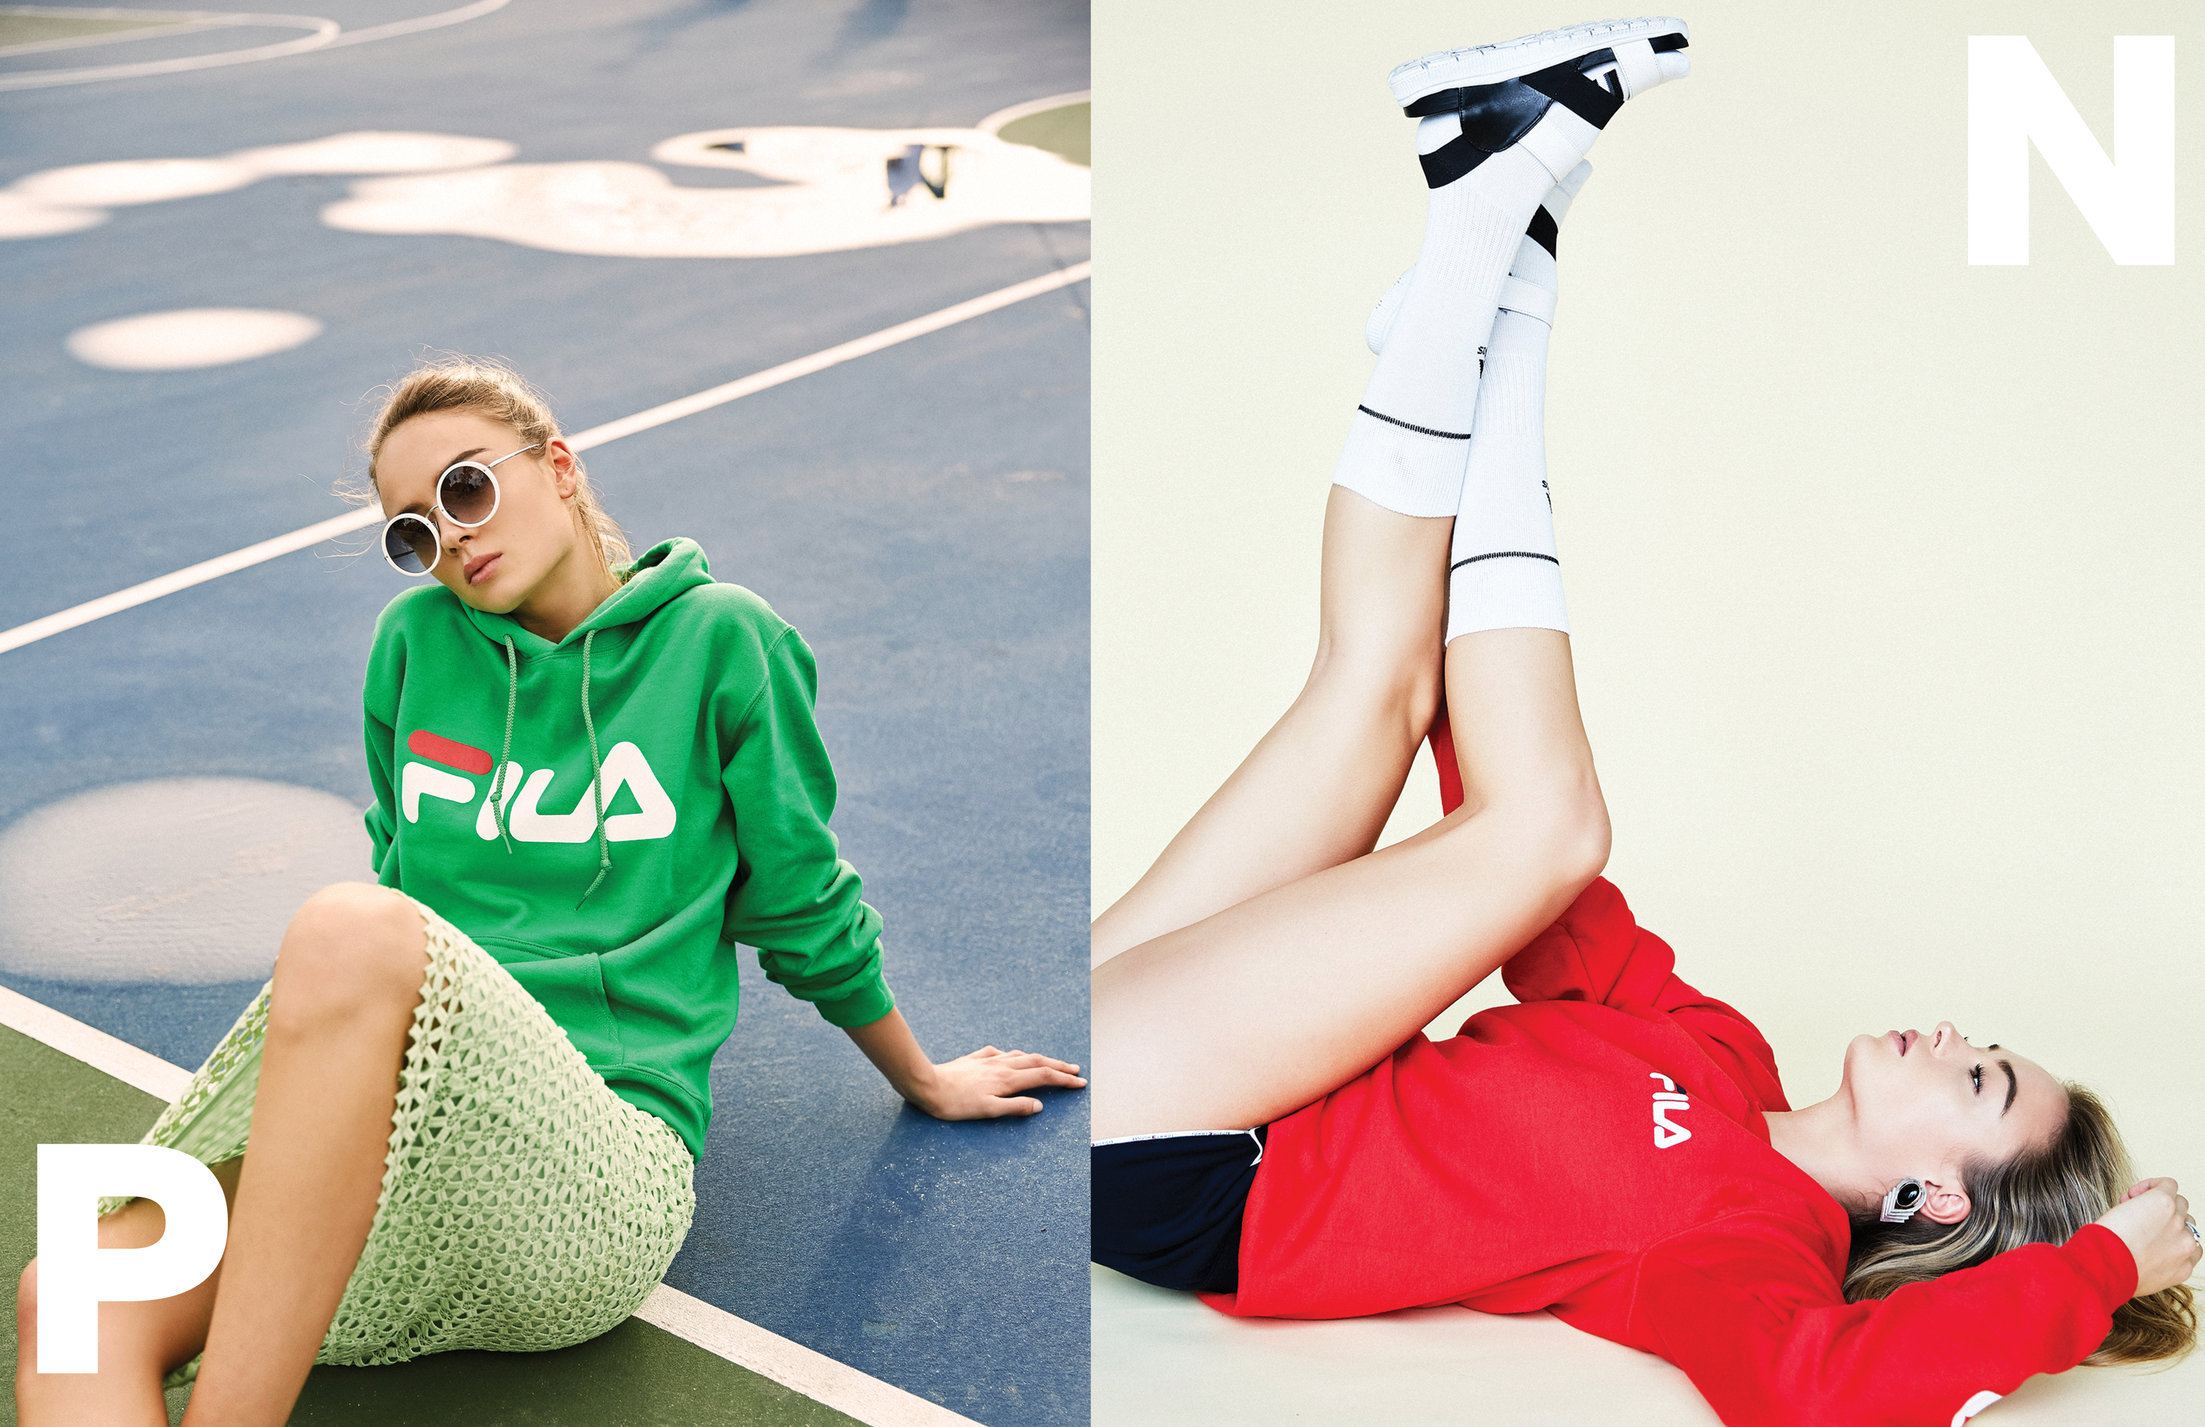 das_models-grate_sport_fashion-photographer-nico-stipcianos-miami-copy-3.jpg